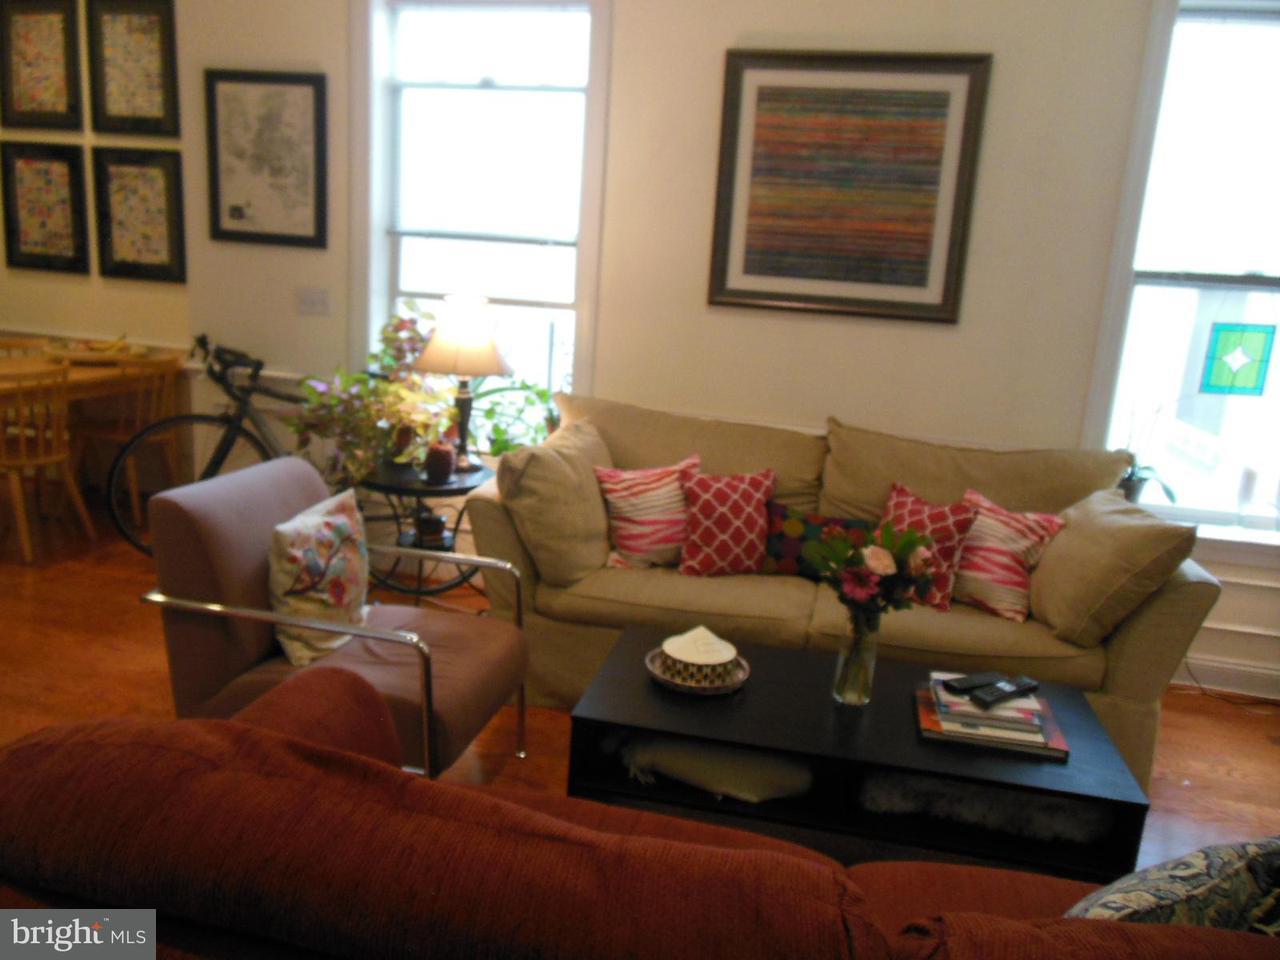 Additional photo for property listing at 1229 12th St Nw #108 1229 12th St Nw #108 Washington, Distrito De Columbia 20005 Estados Unidos